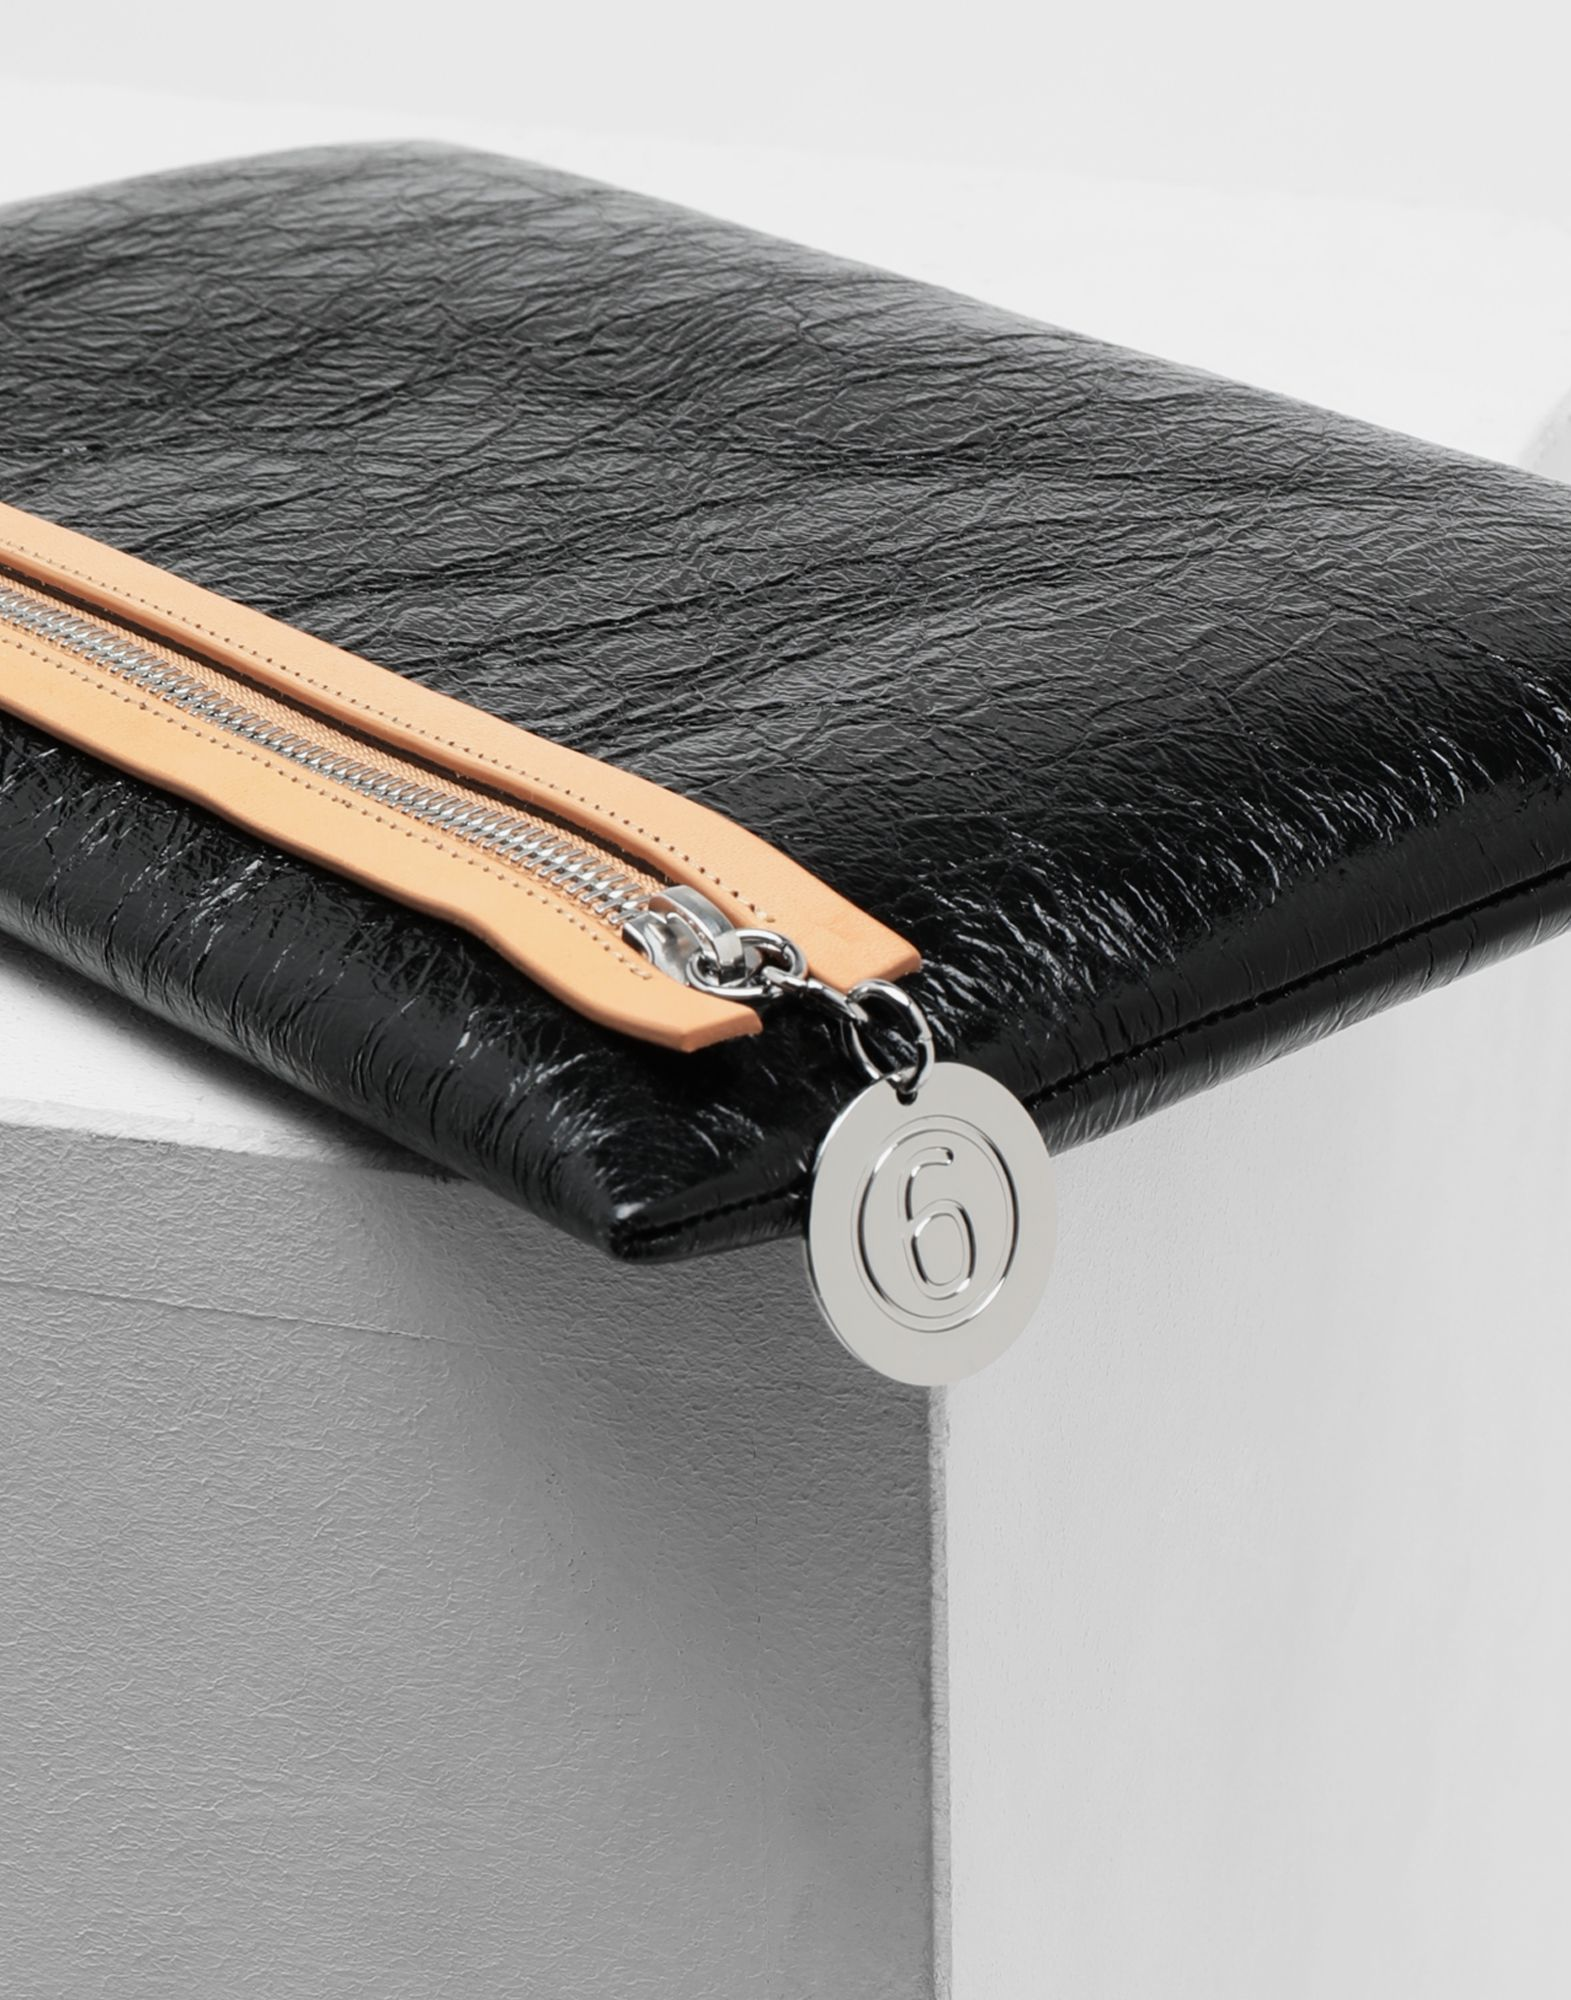 MM6 MAISON MARGIELA Crinkled leather zip pochette Wallet Woman d